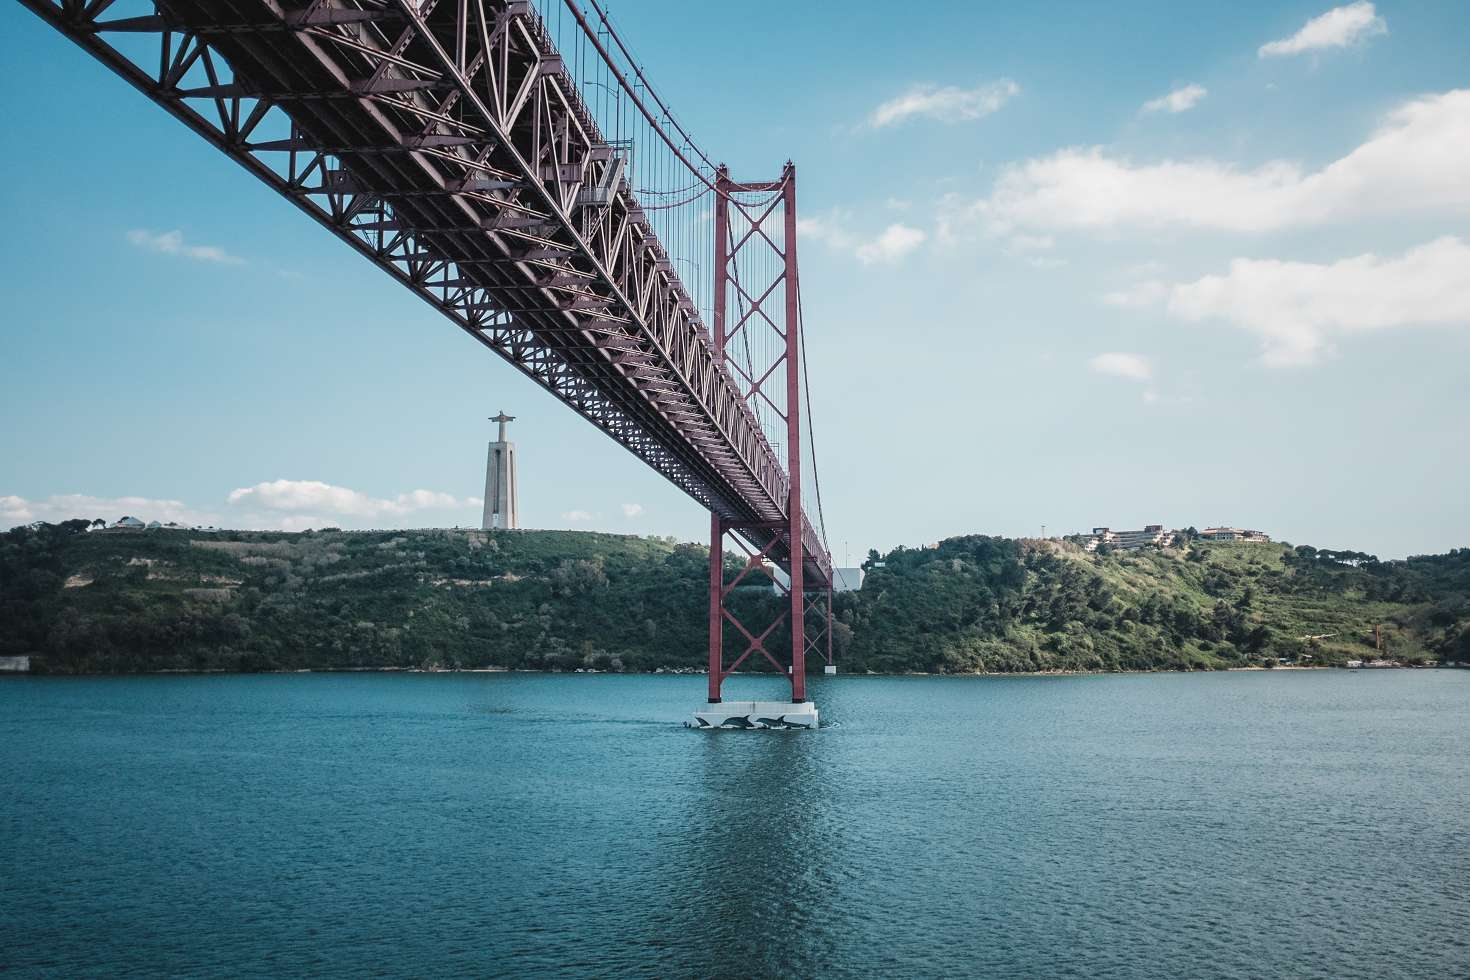 Valencia-Lissabon-Vigo-Stonehenge (54)